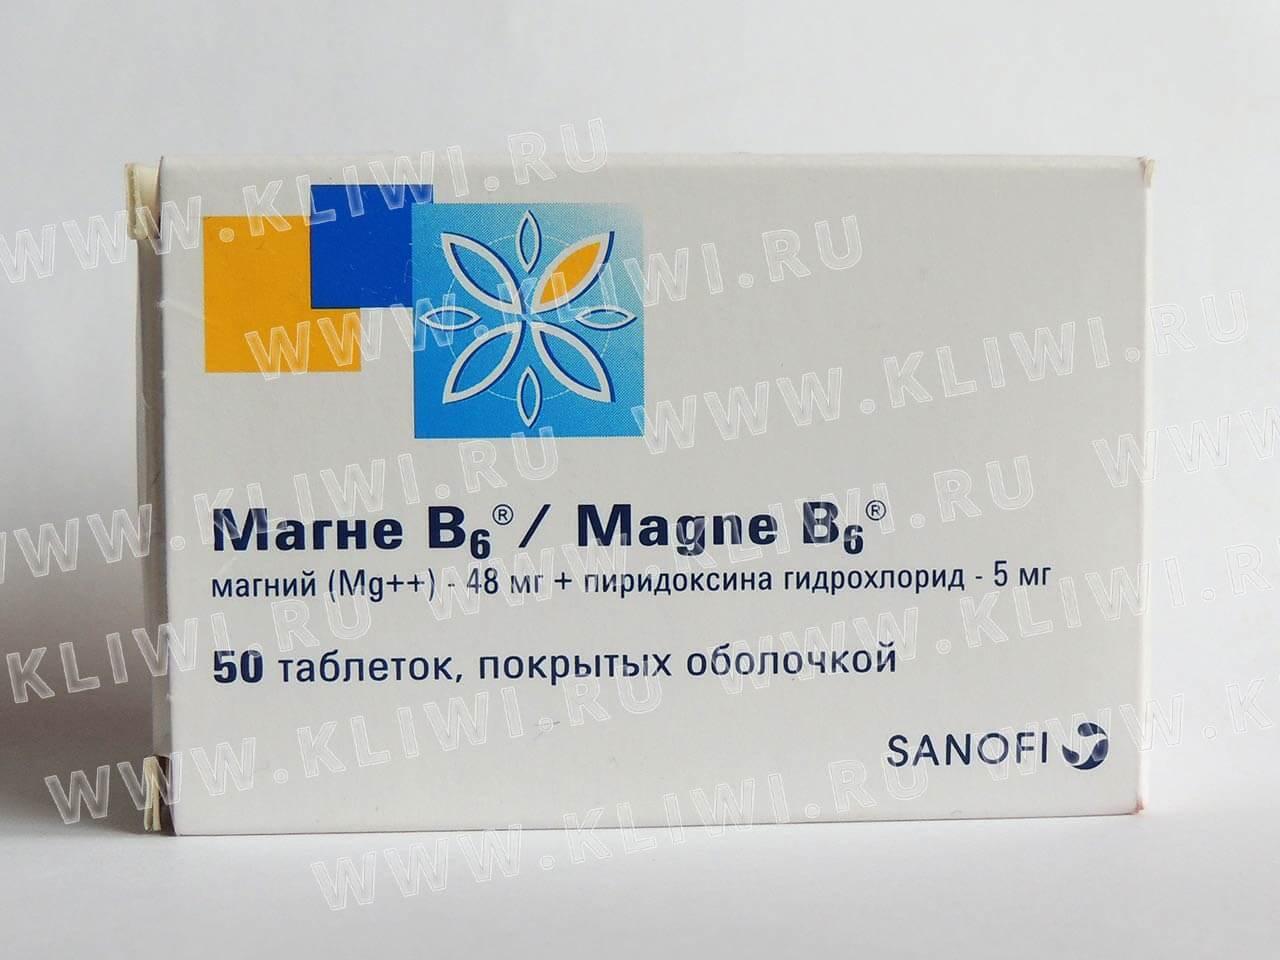 magnio b6 hipertenzija